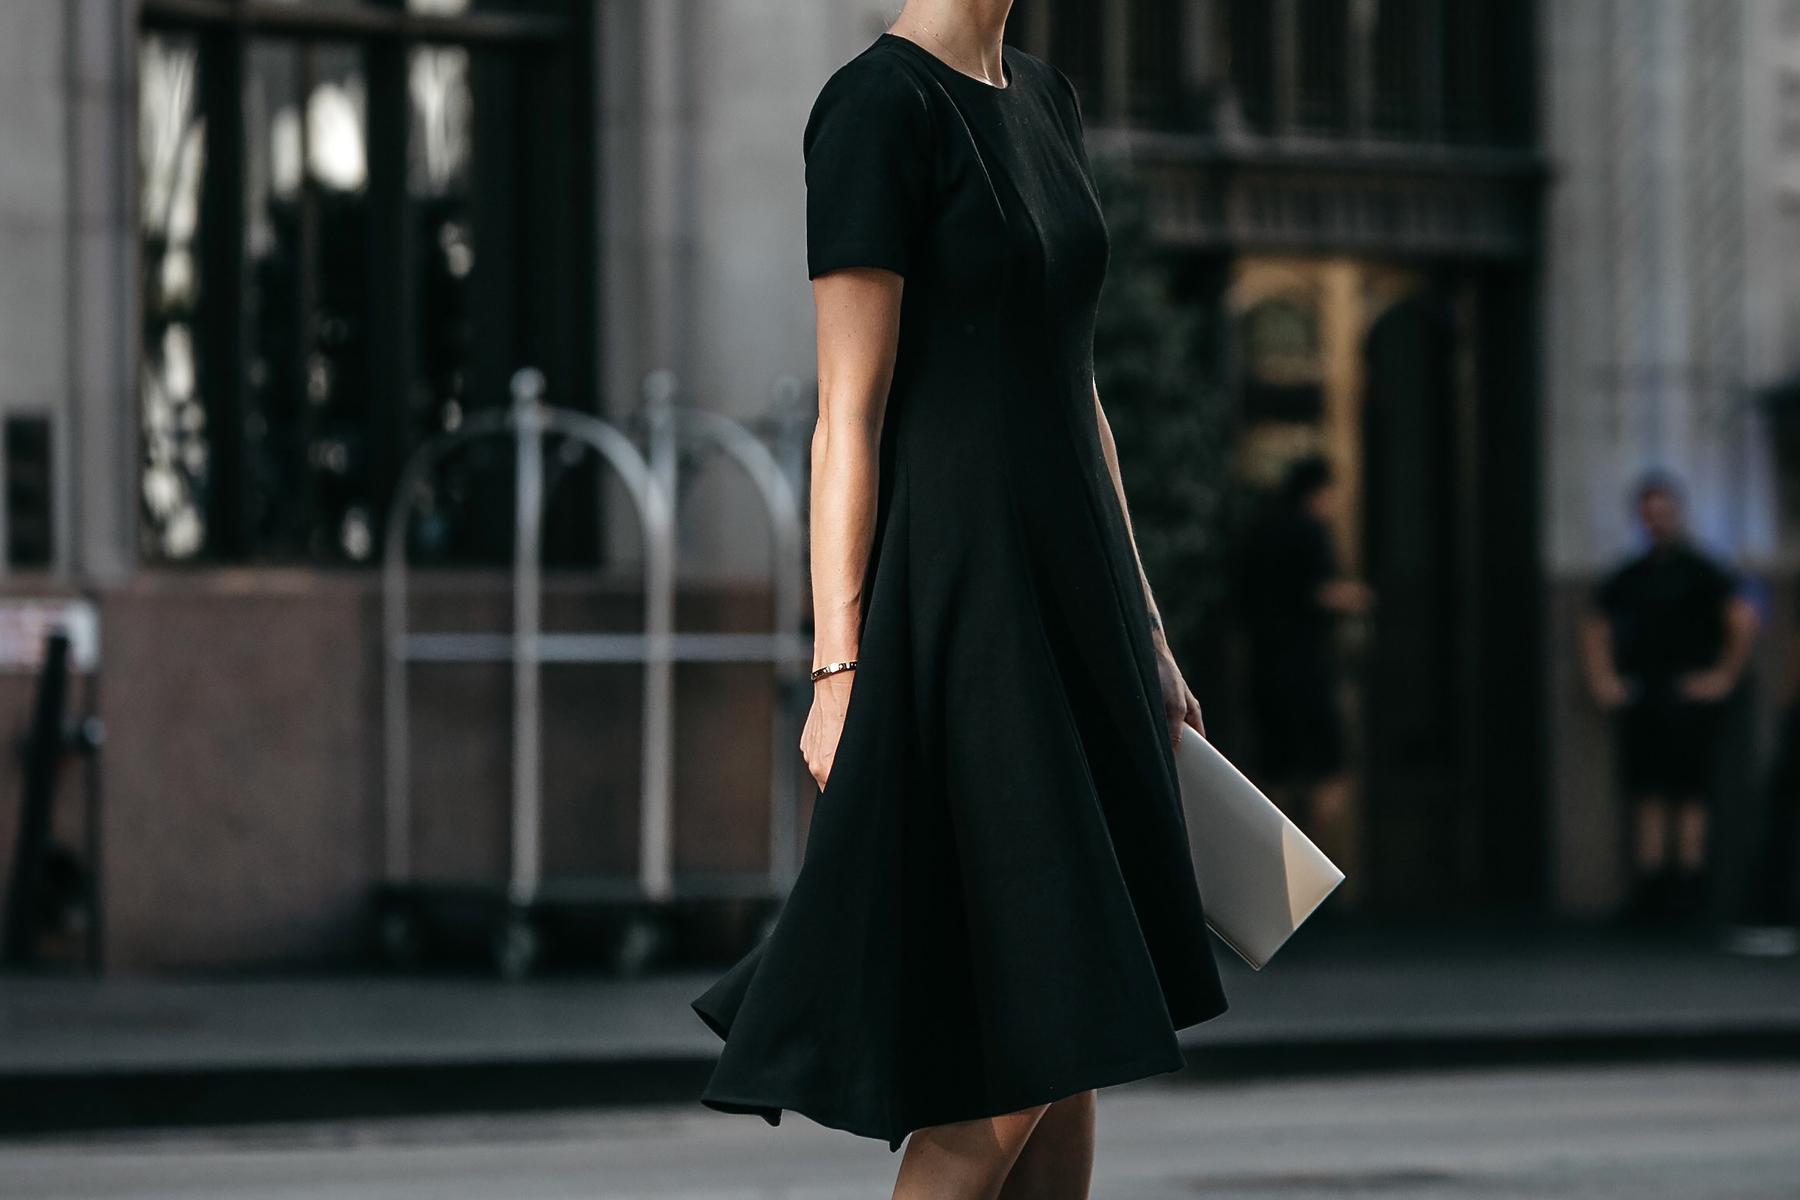 Black Halo Asymmetrical Little Black Dress Fashion Jackson Dallas Blogger Fashion Blogger Street Style